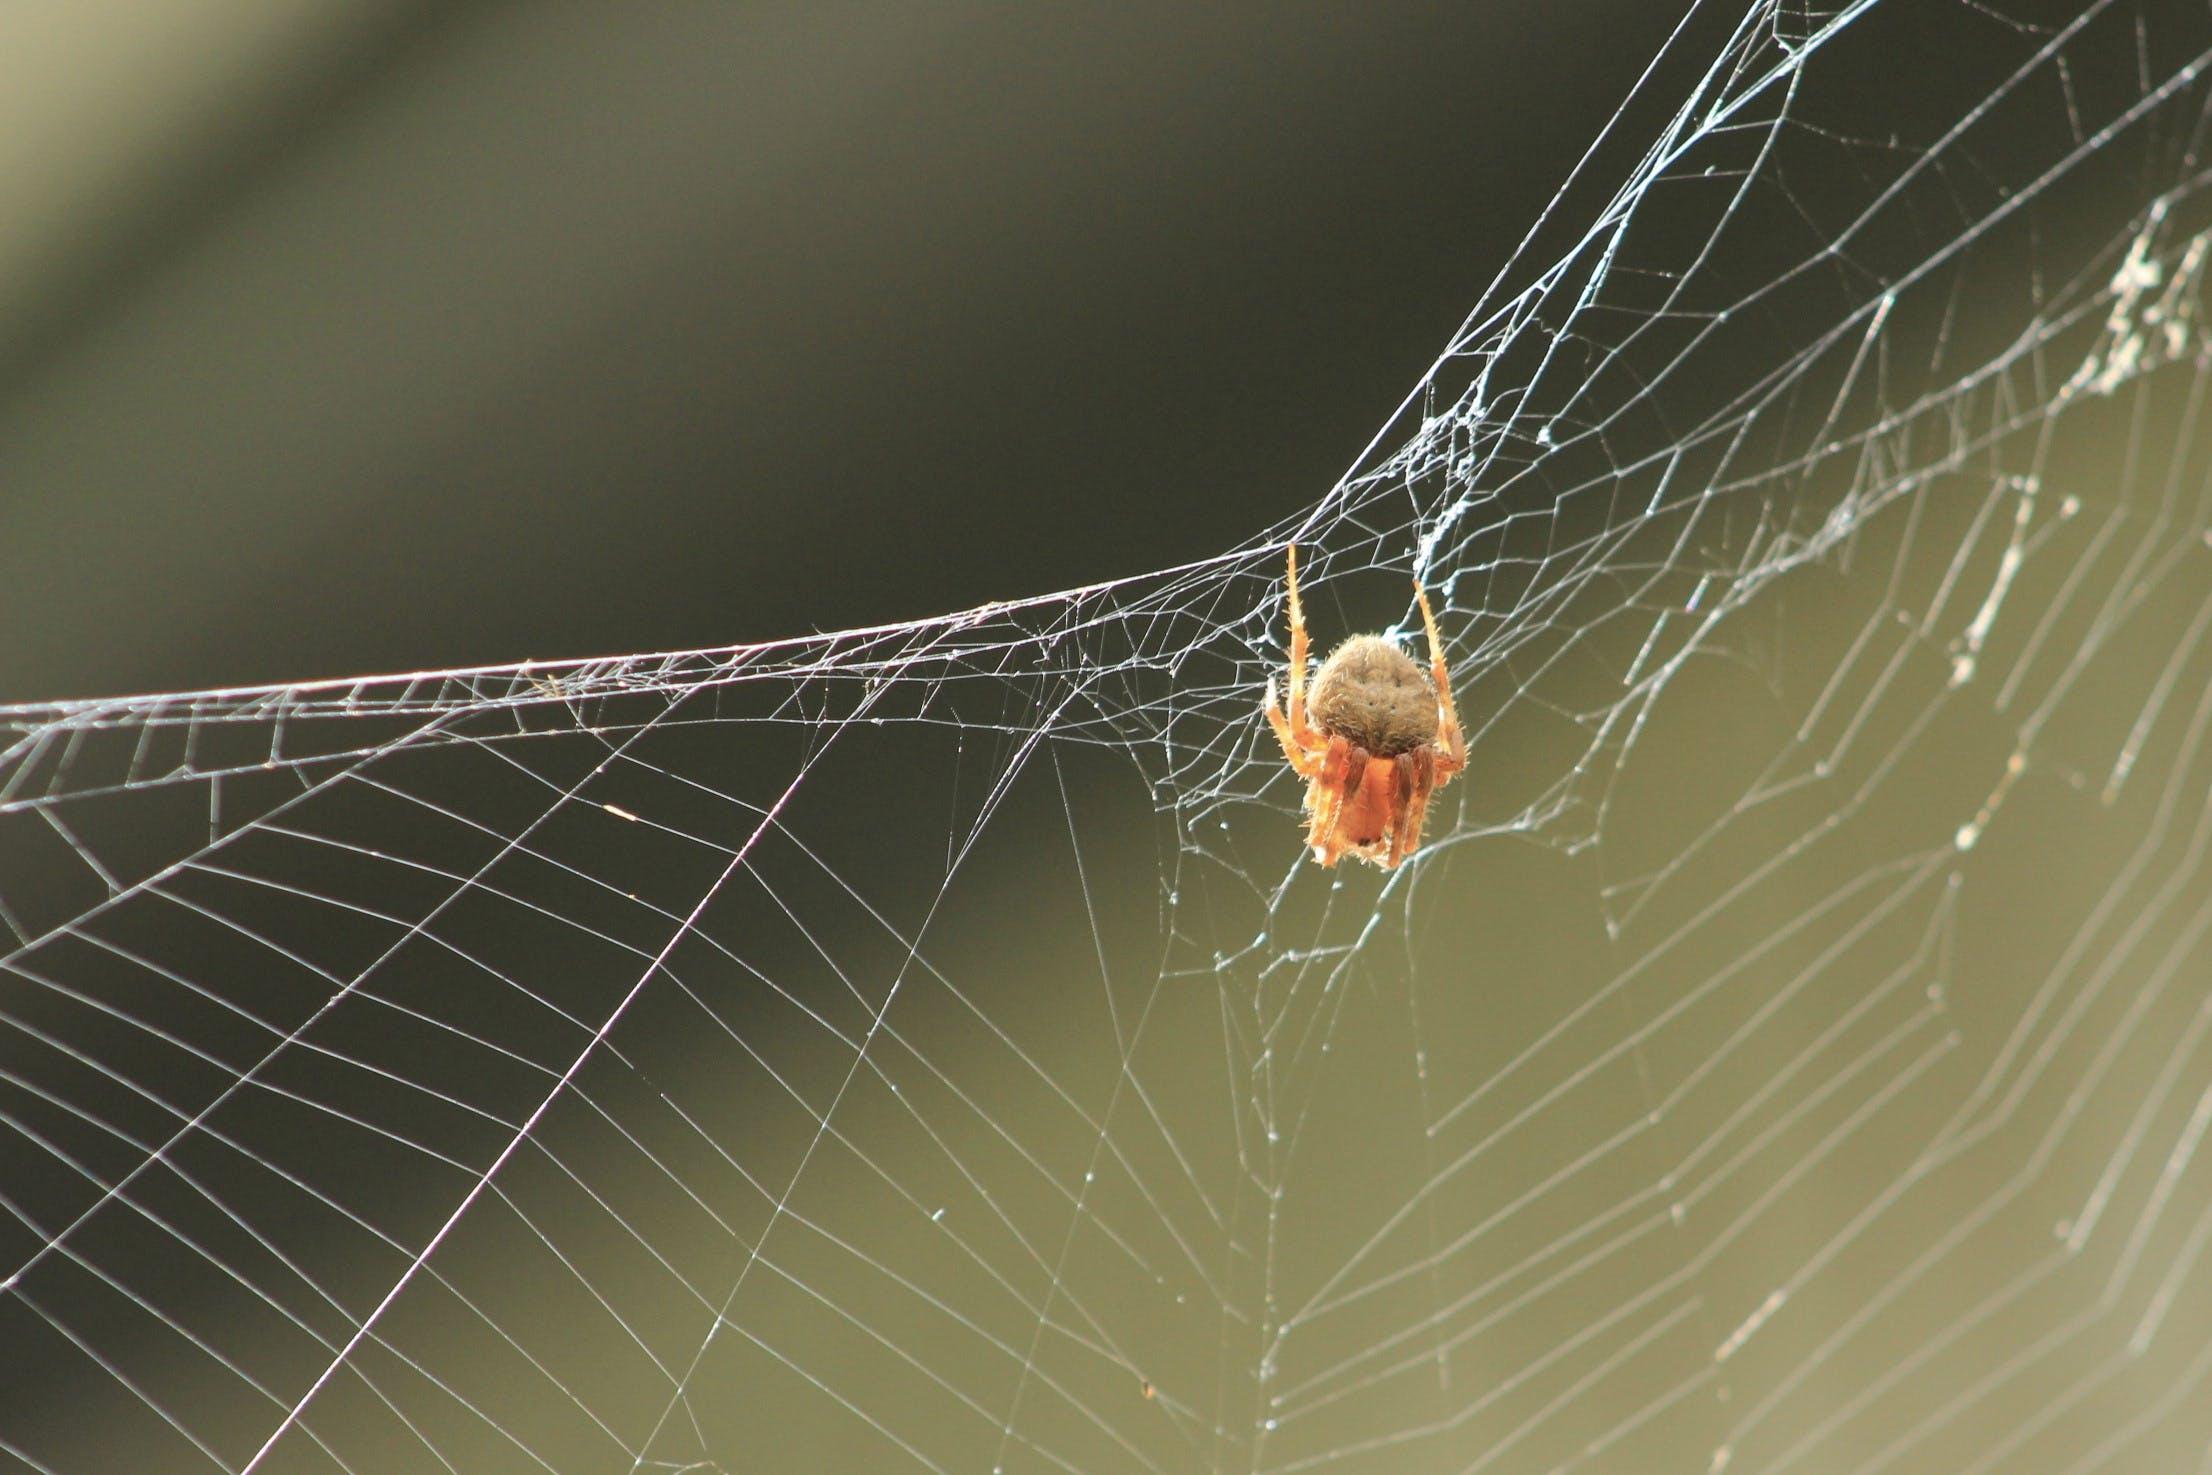 Gratis stockfoto met spin, spinnenweb